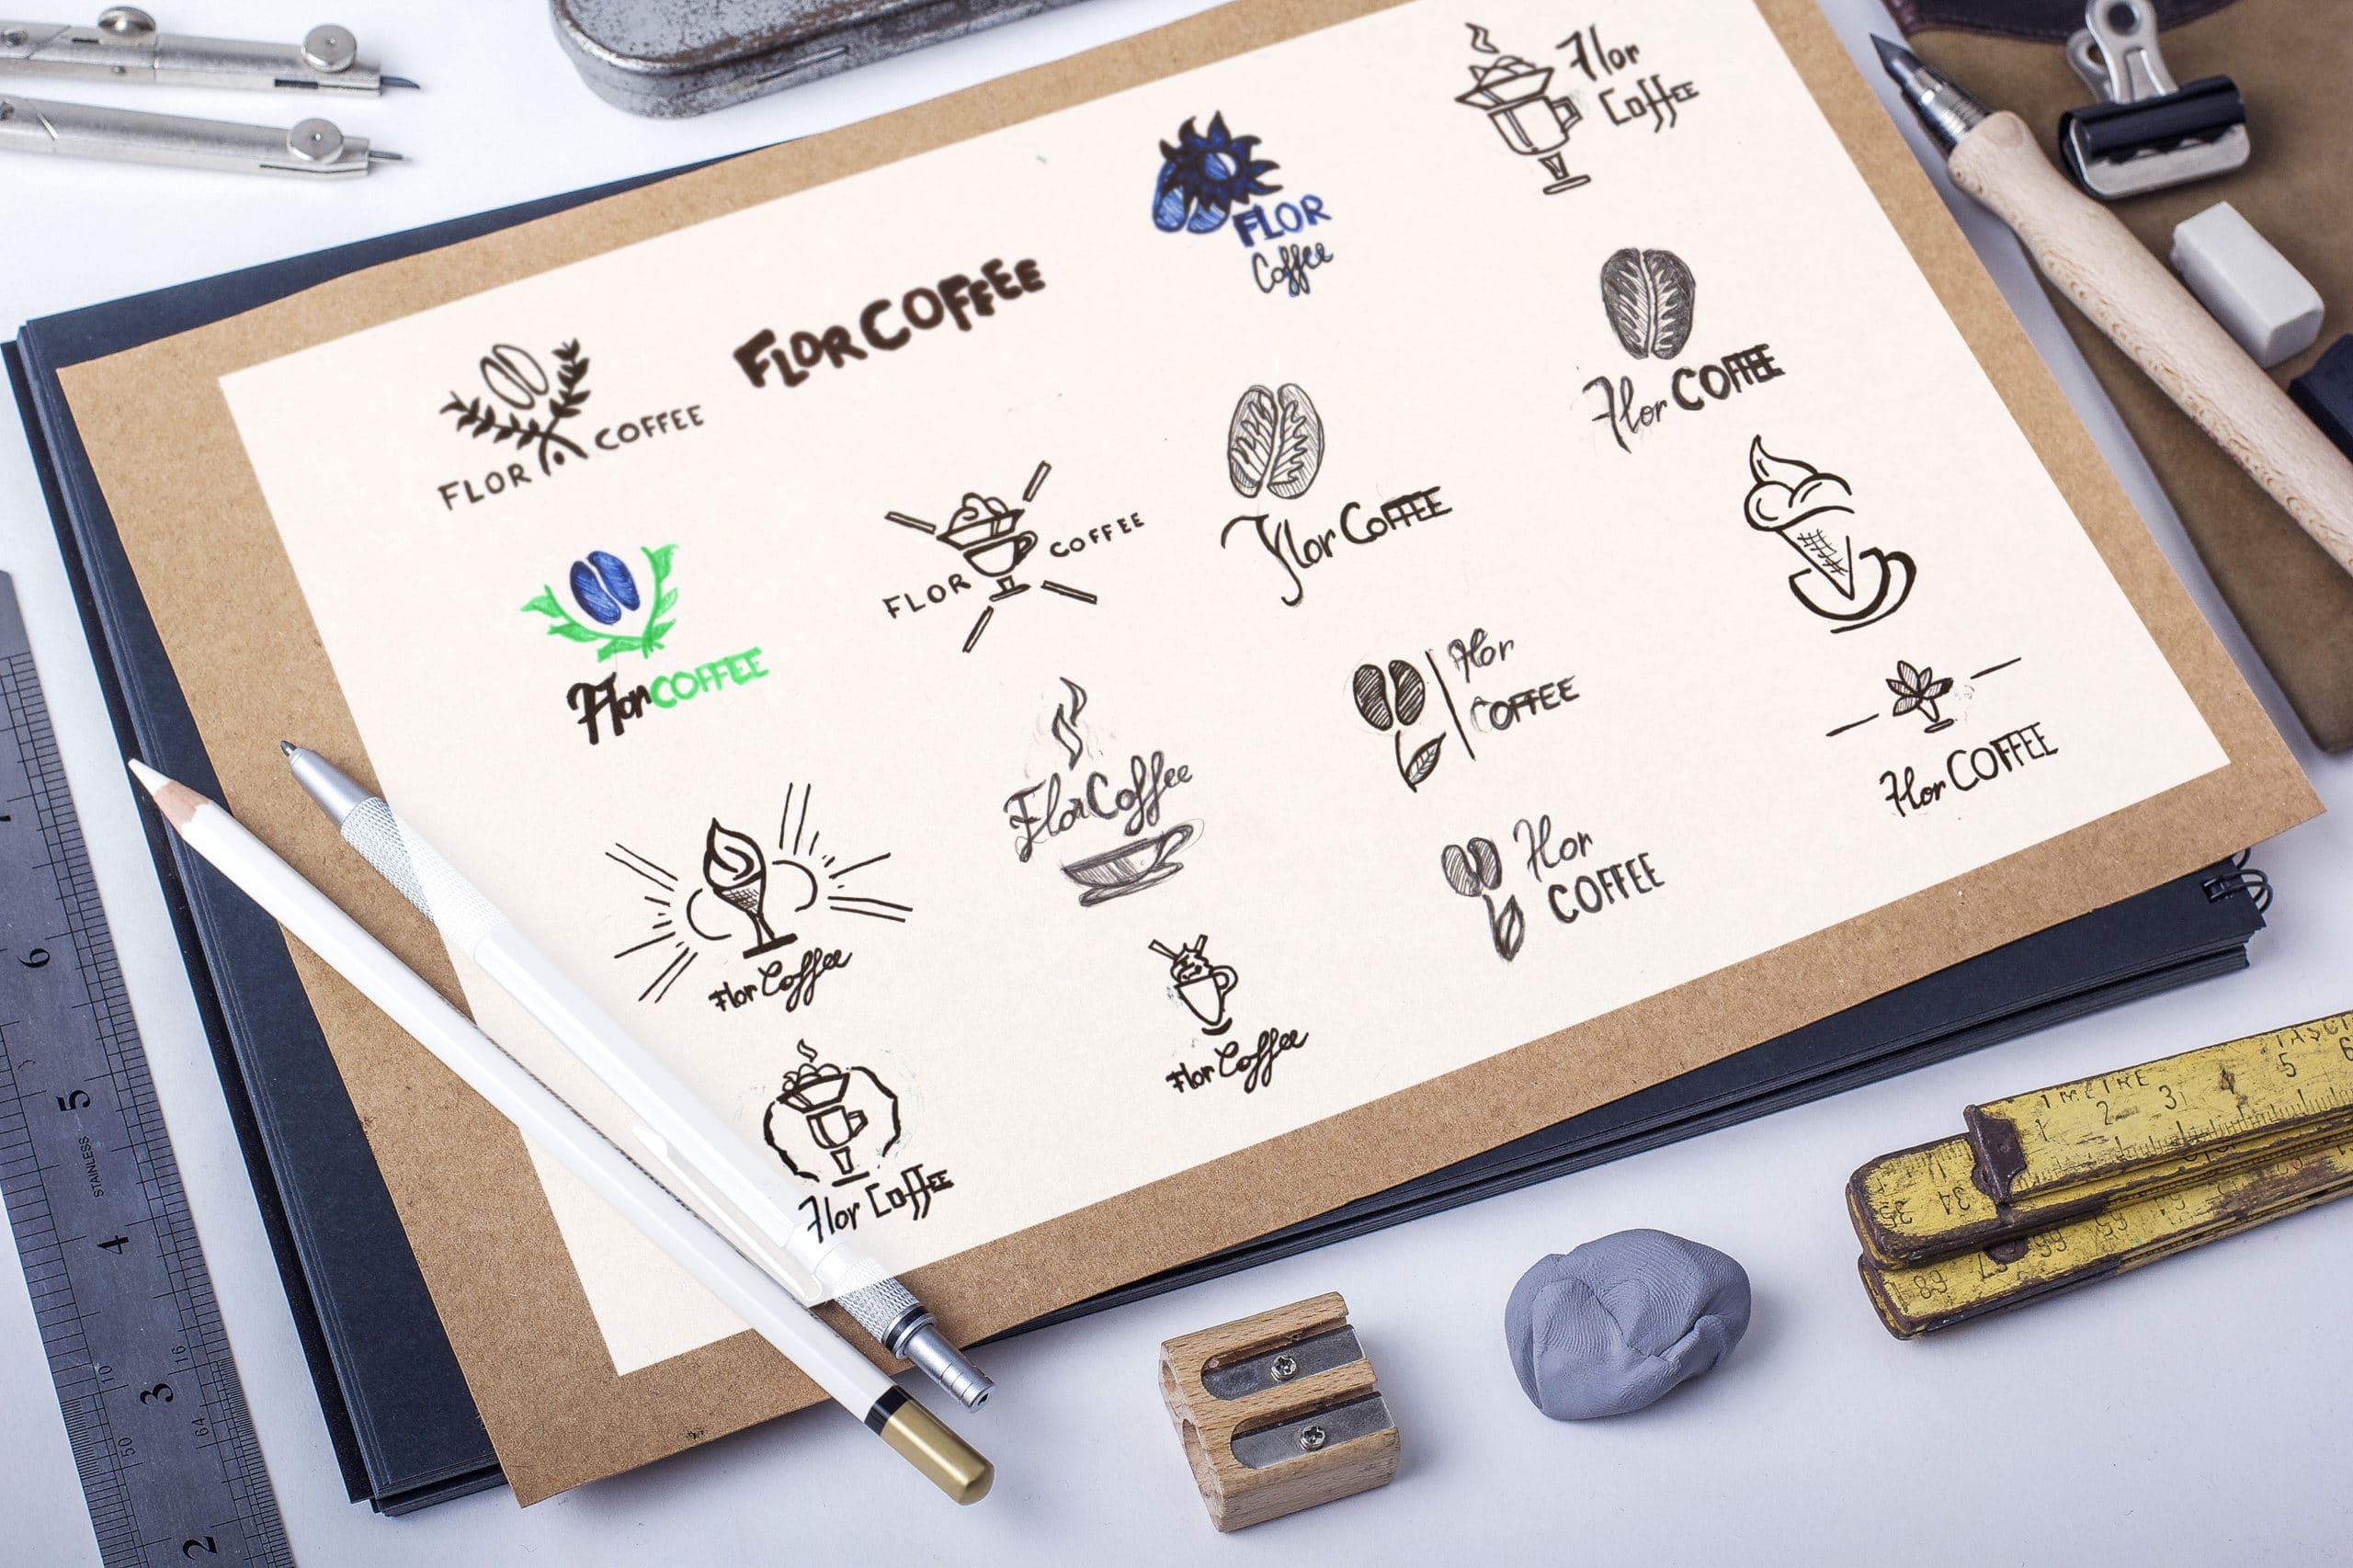 Croquis Stketches flor Coffee, logo, recherches visuelles,